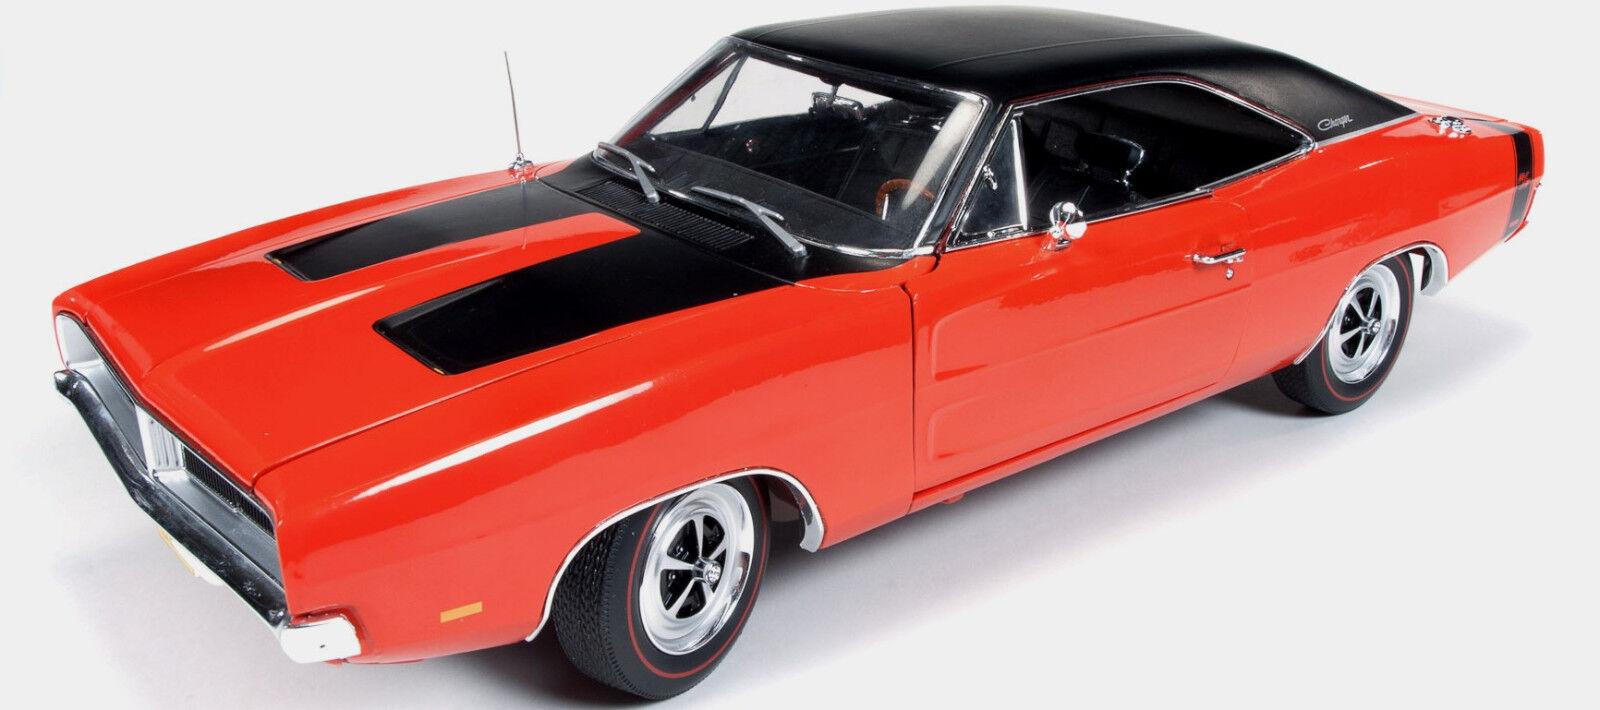 1969 Dodge Charger R T HEMI-Orange 1 18 Auto World 1026